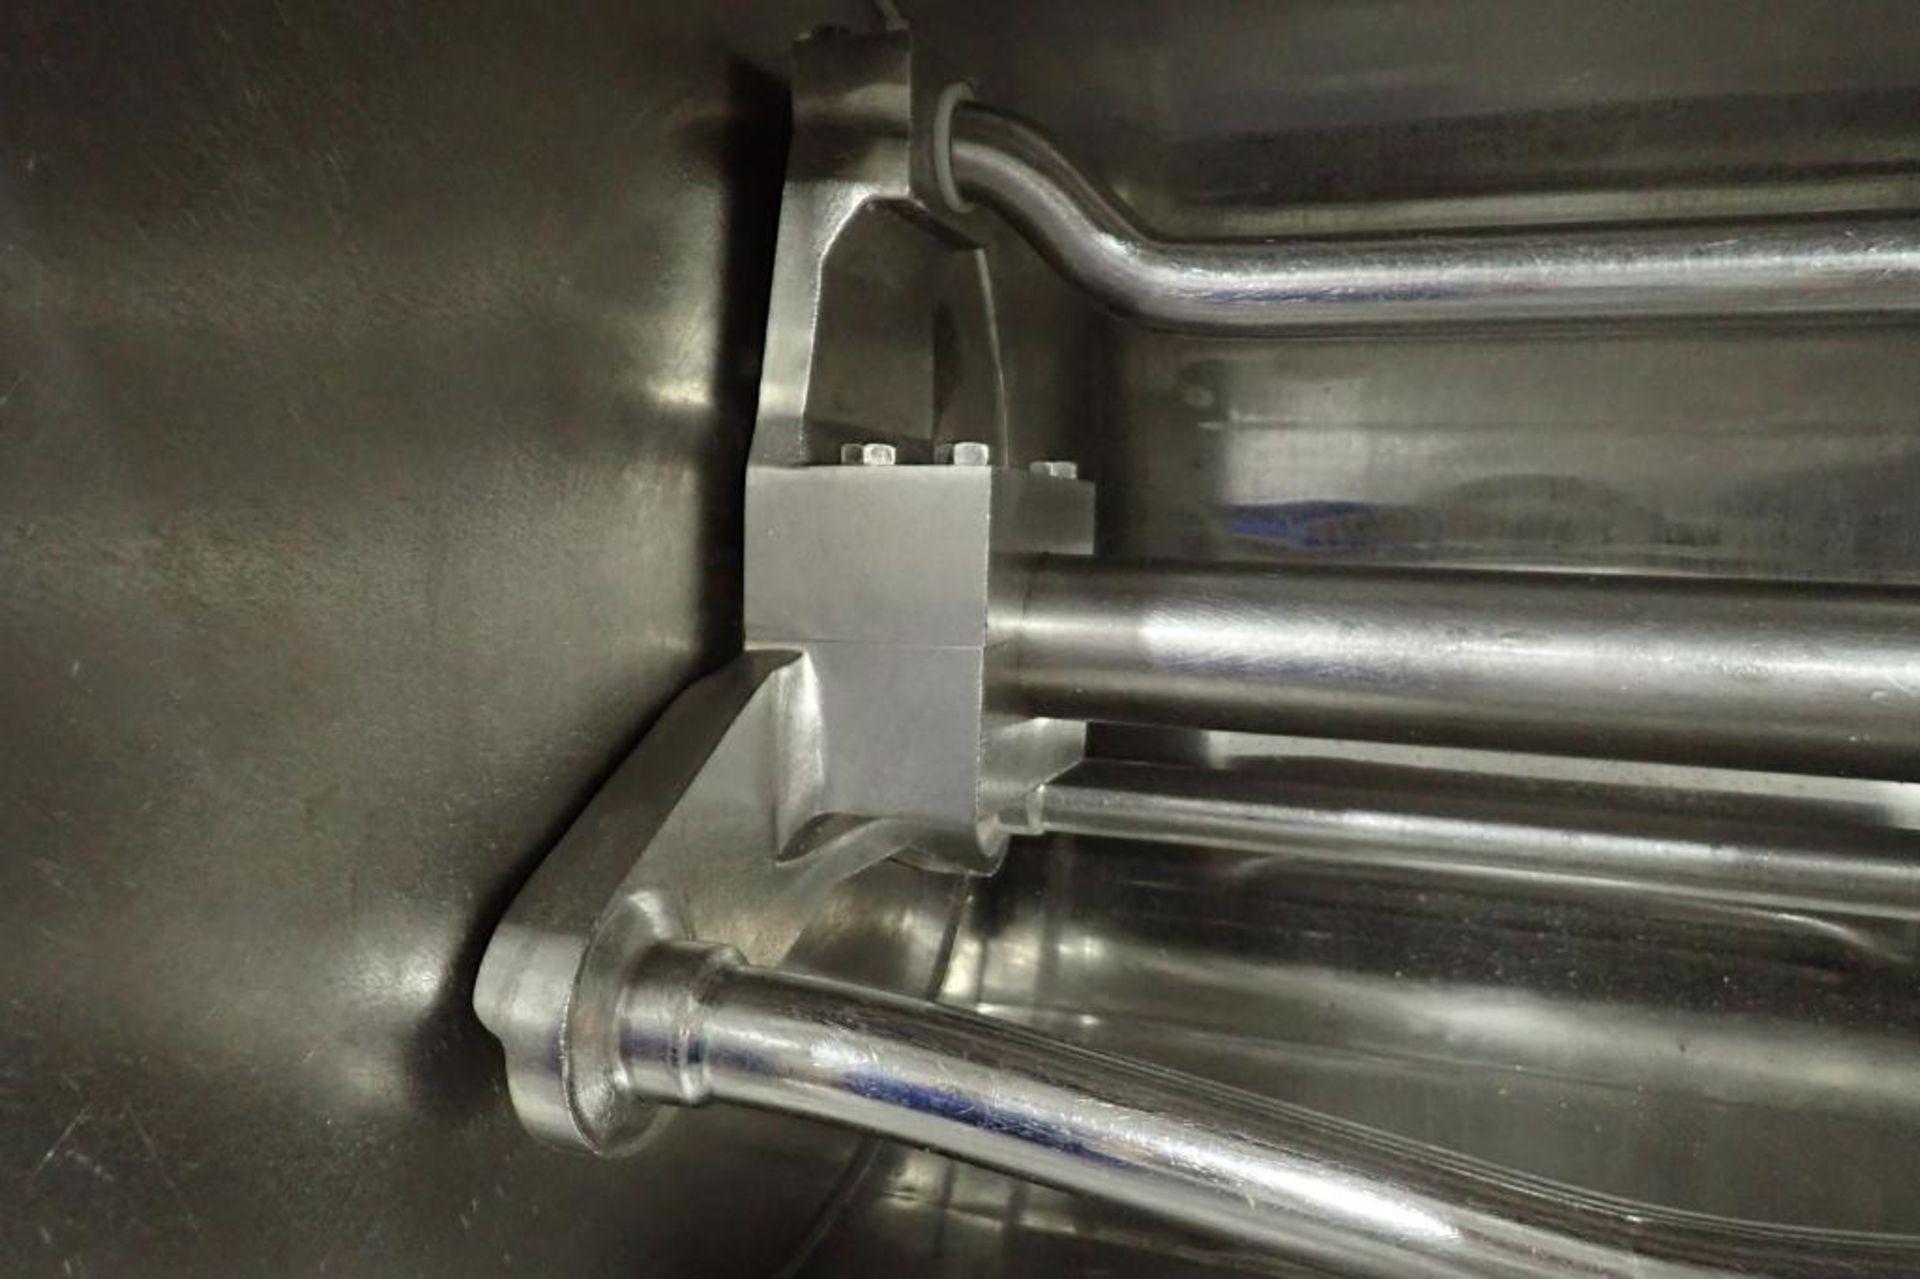 Lot 67 - Peerless roller bar mixer {Located in Avon, IN}